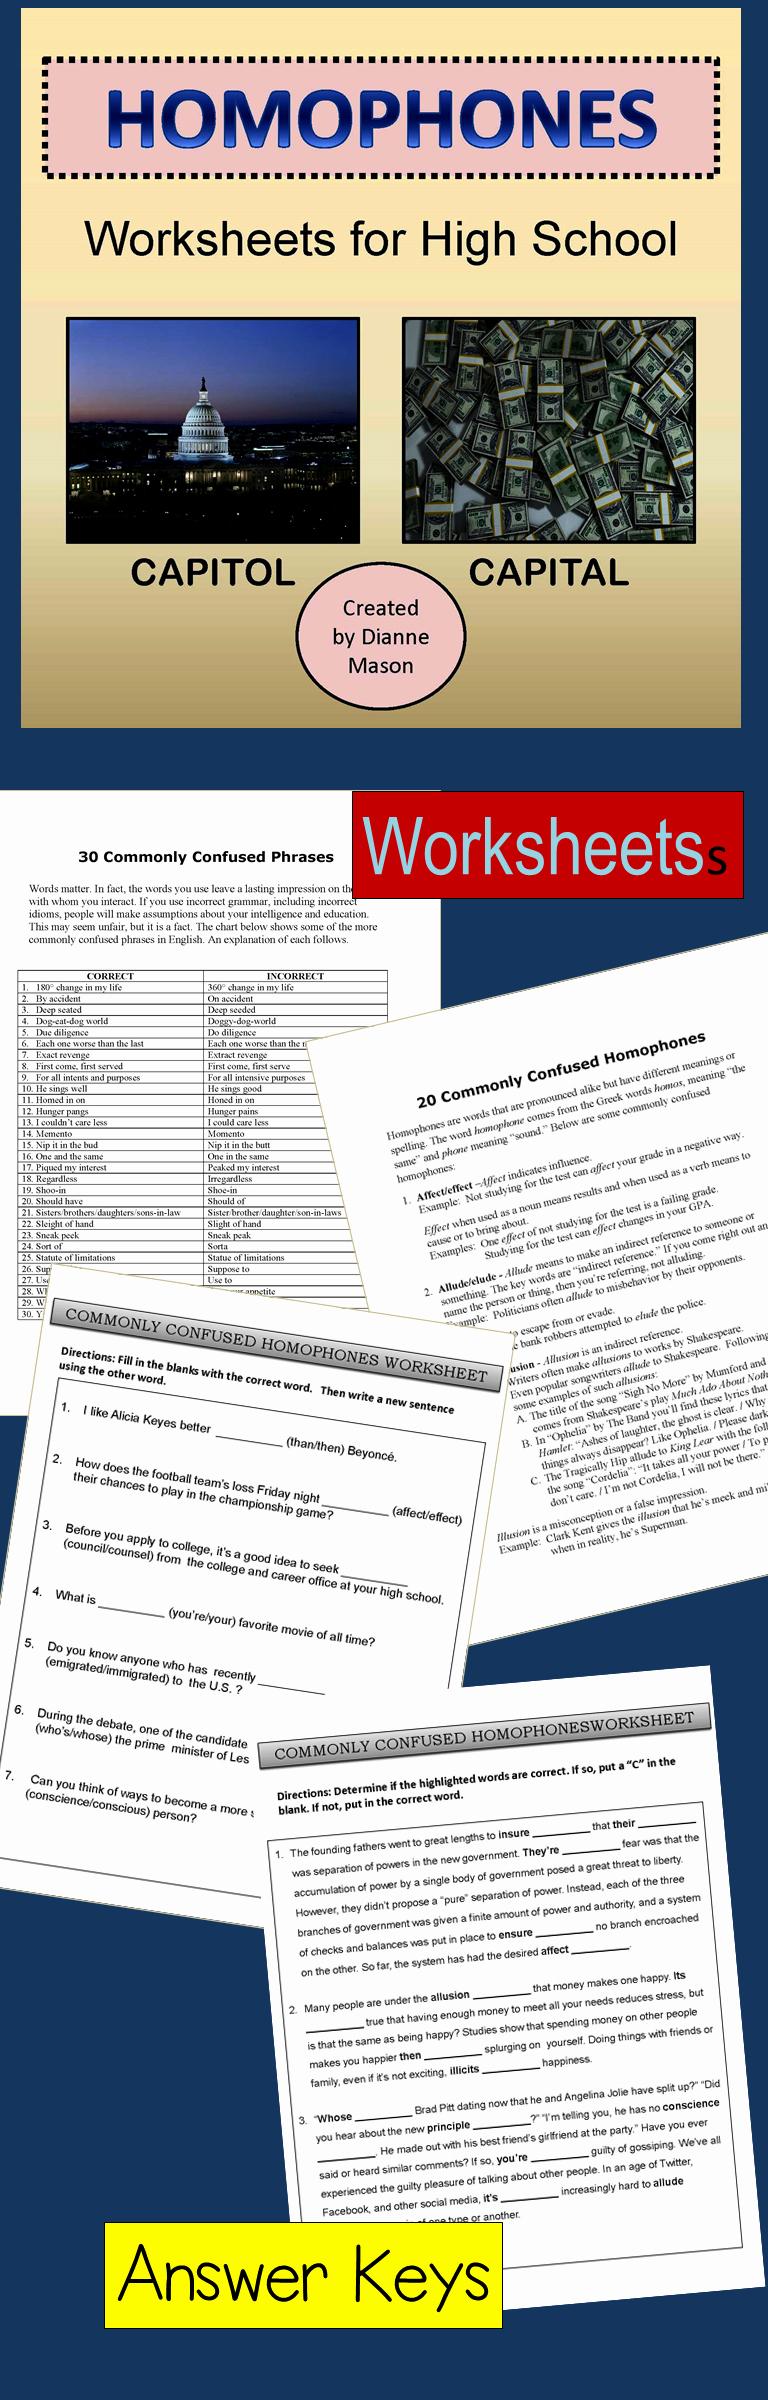 Homonym Worksheets High School New Homophones Worksheets for High School